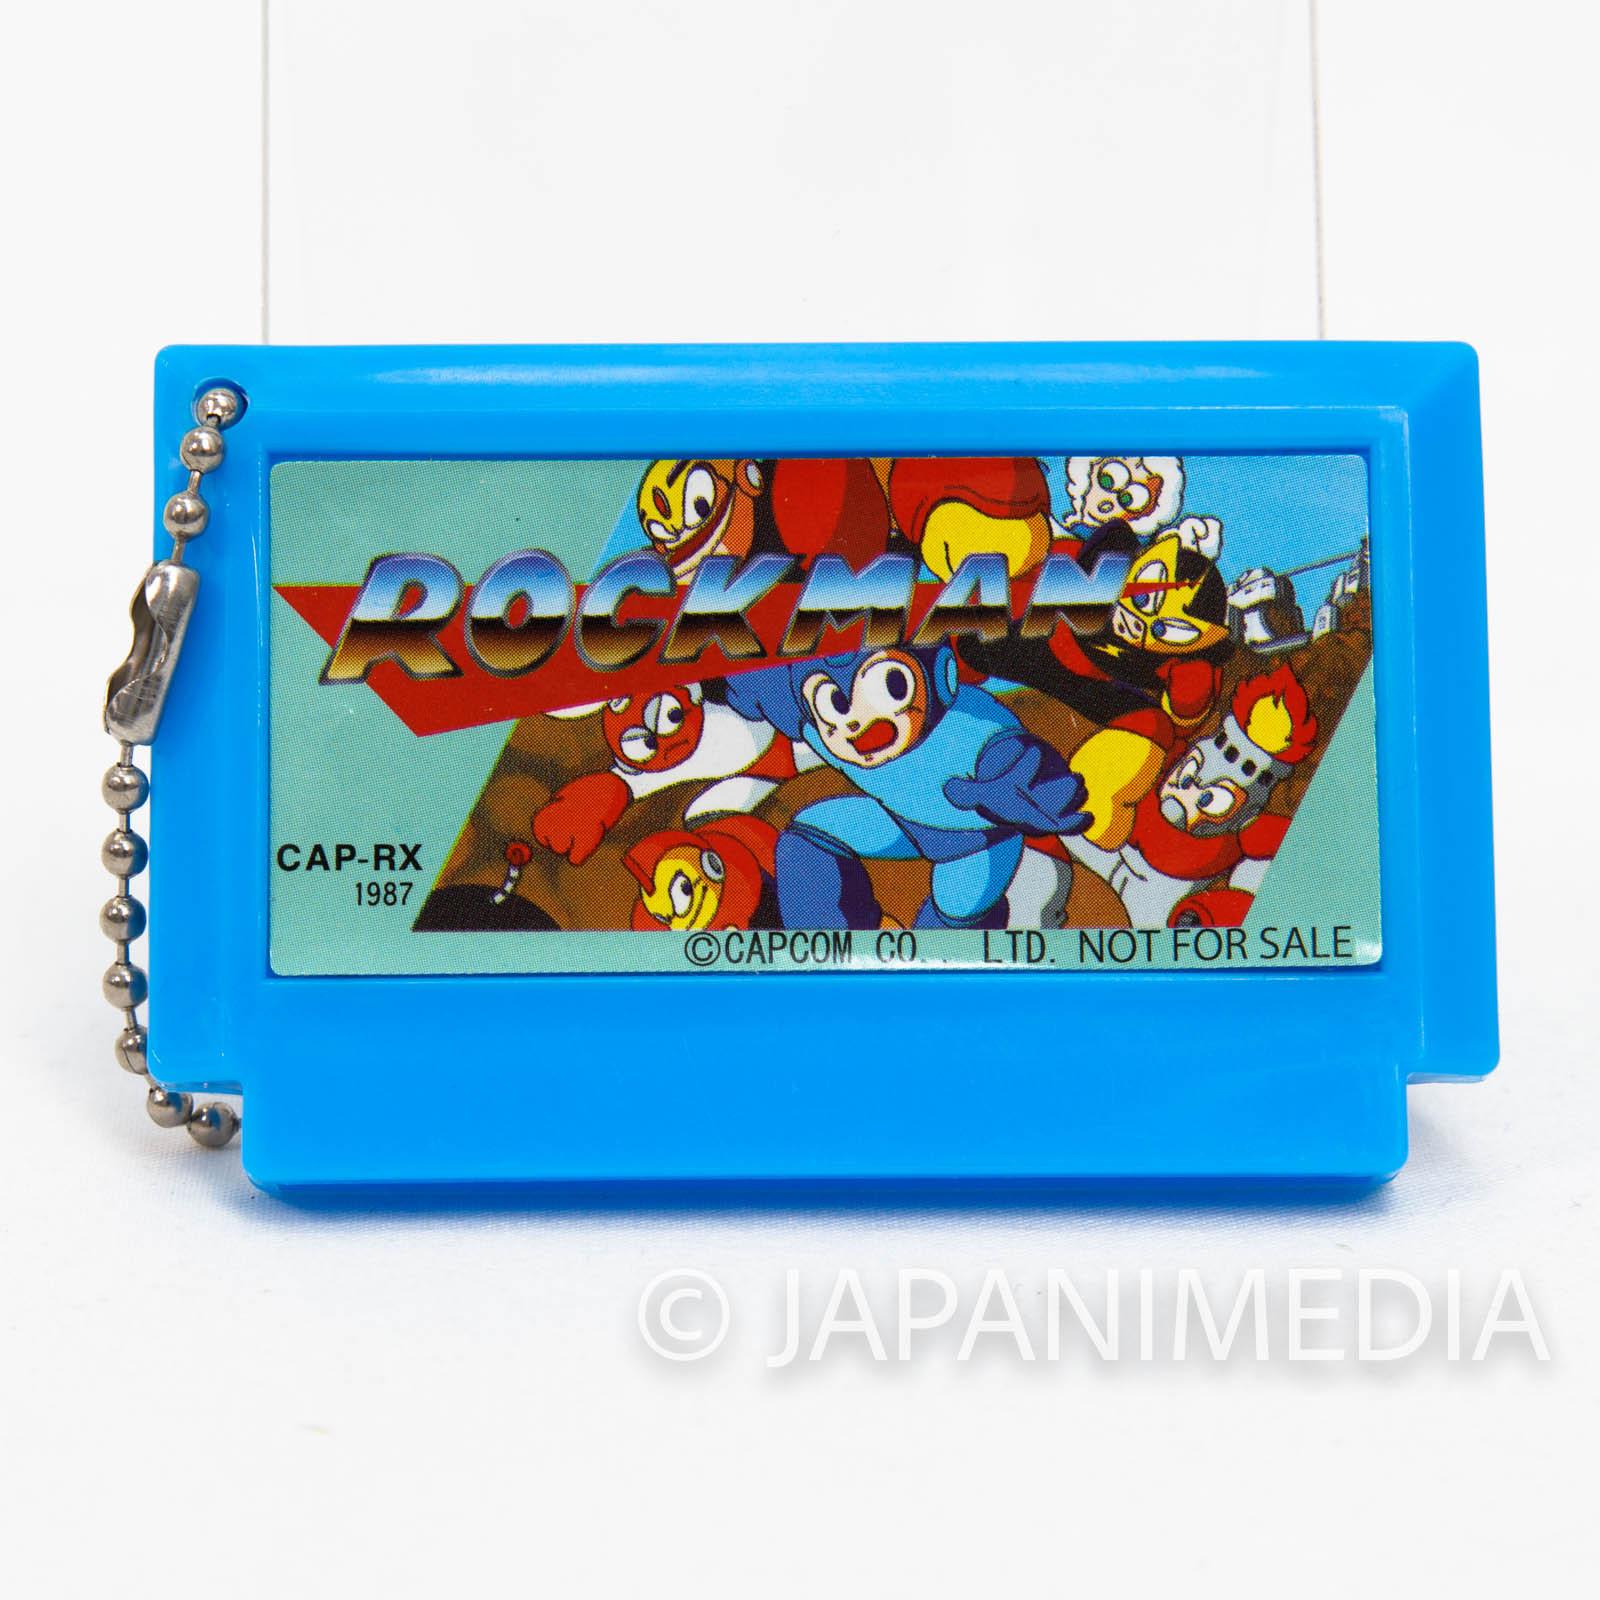 Rockman Cassette Type Mascot Ball Keychain Capcom JAPAN GAME FAMICOM NEC